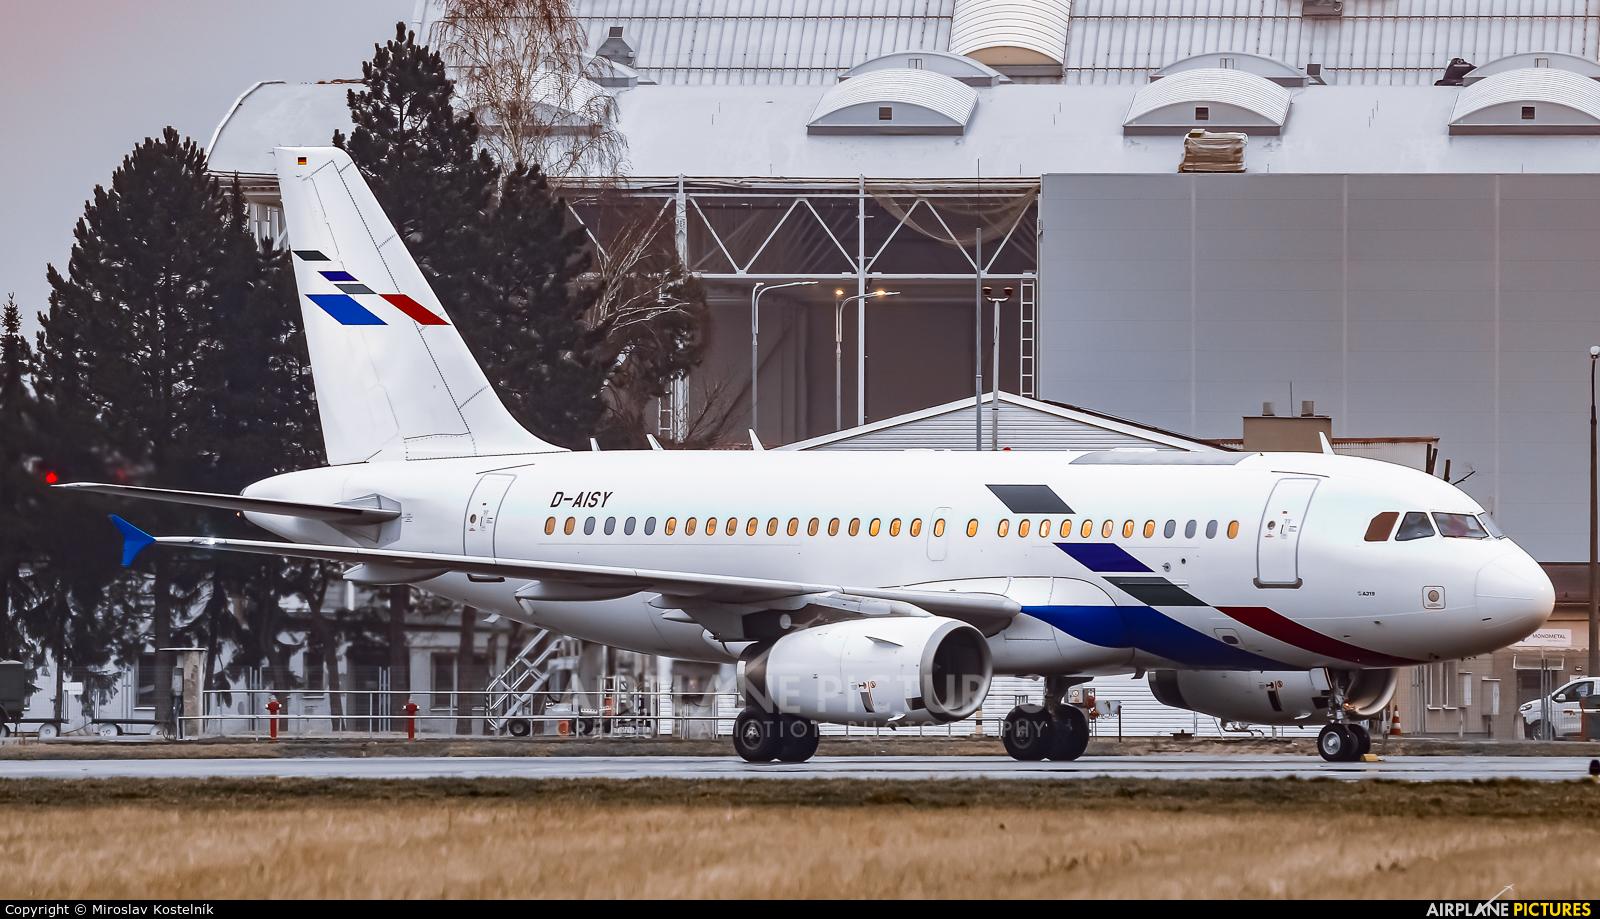 Lufthansa D-AISY aircraft at Ostrava Mošnov